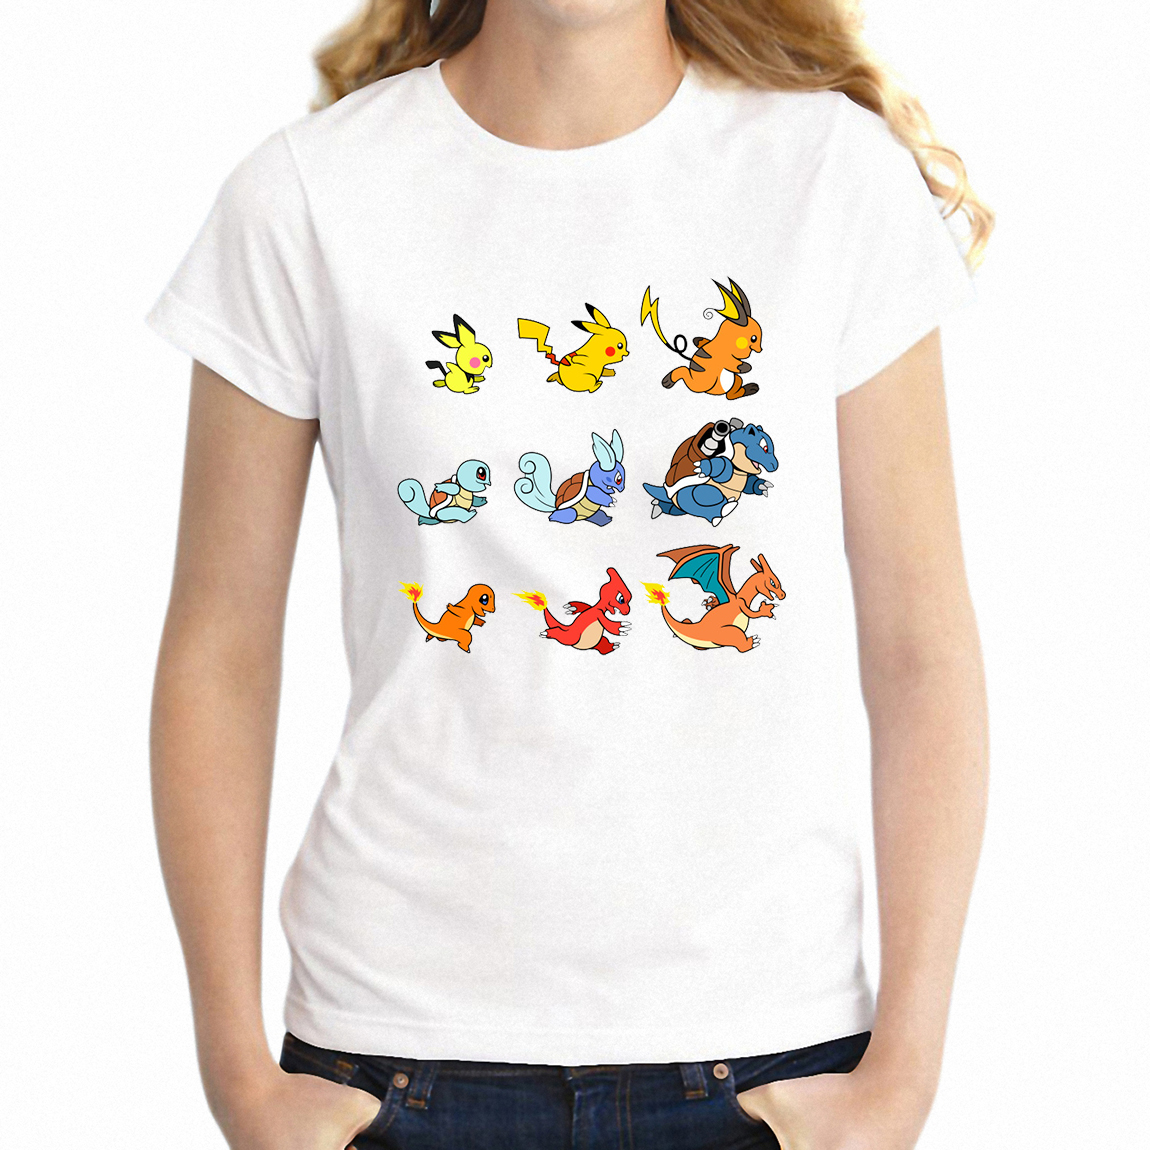 summer-women's-t-shirt-font-b-pokemon-b-font-evolution-pikachu-charizard-squirtle-artsy-girl's-short-sleeve-tshirt-tee-harajuku-streetwear